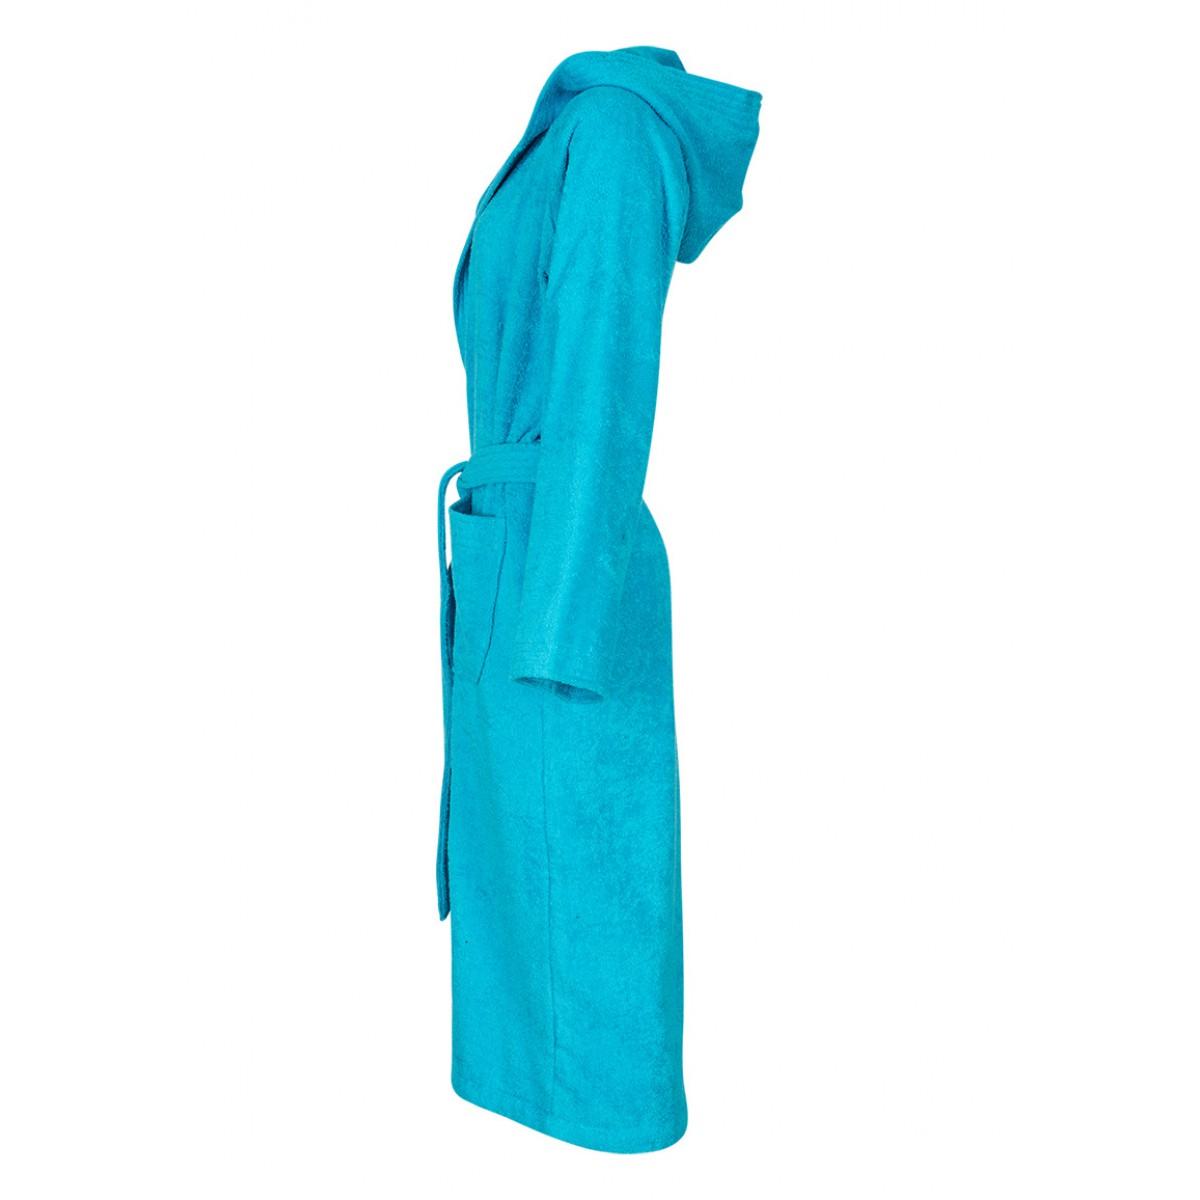 Aquablauwe saunabadjas